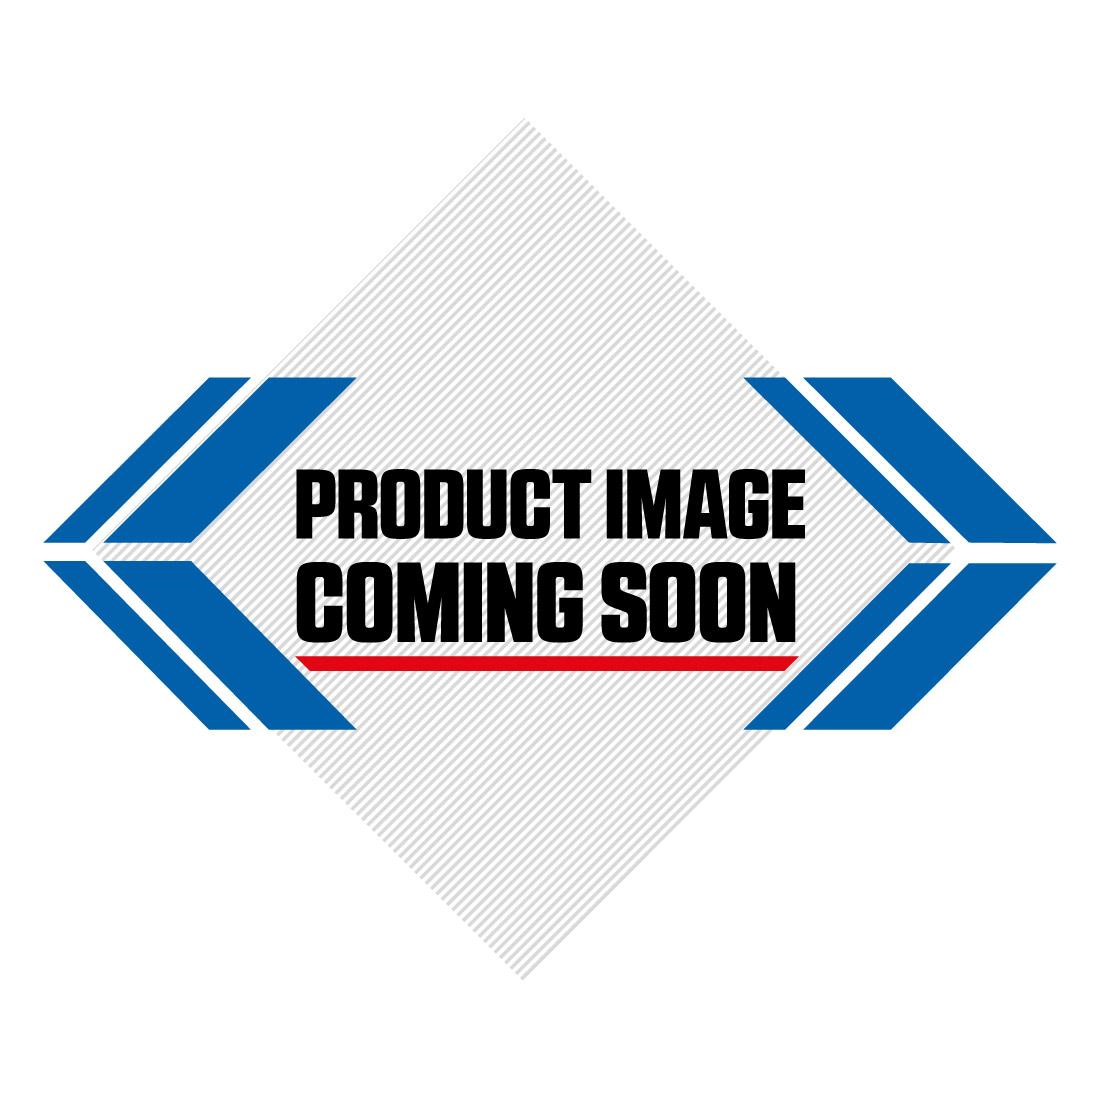 Renthal Twinring Rear Sprocket KTM SX SX-F EXC EXC-F Husqvarna TC FC TE FE - Orange Image-3>